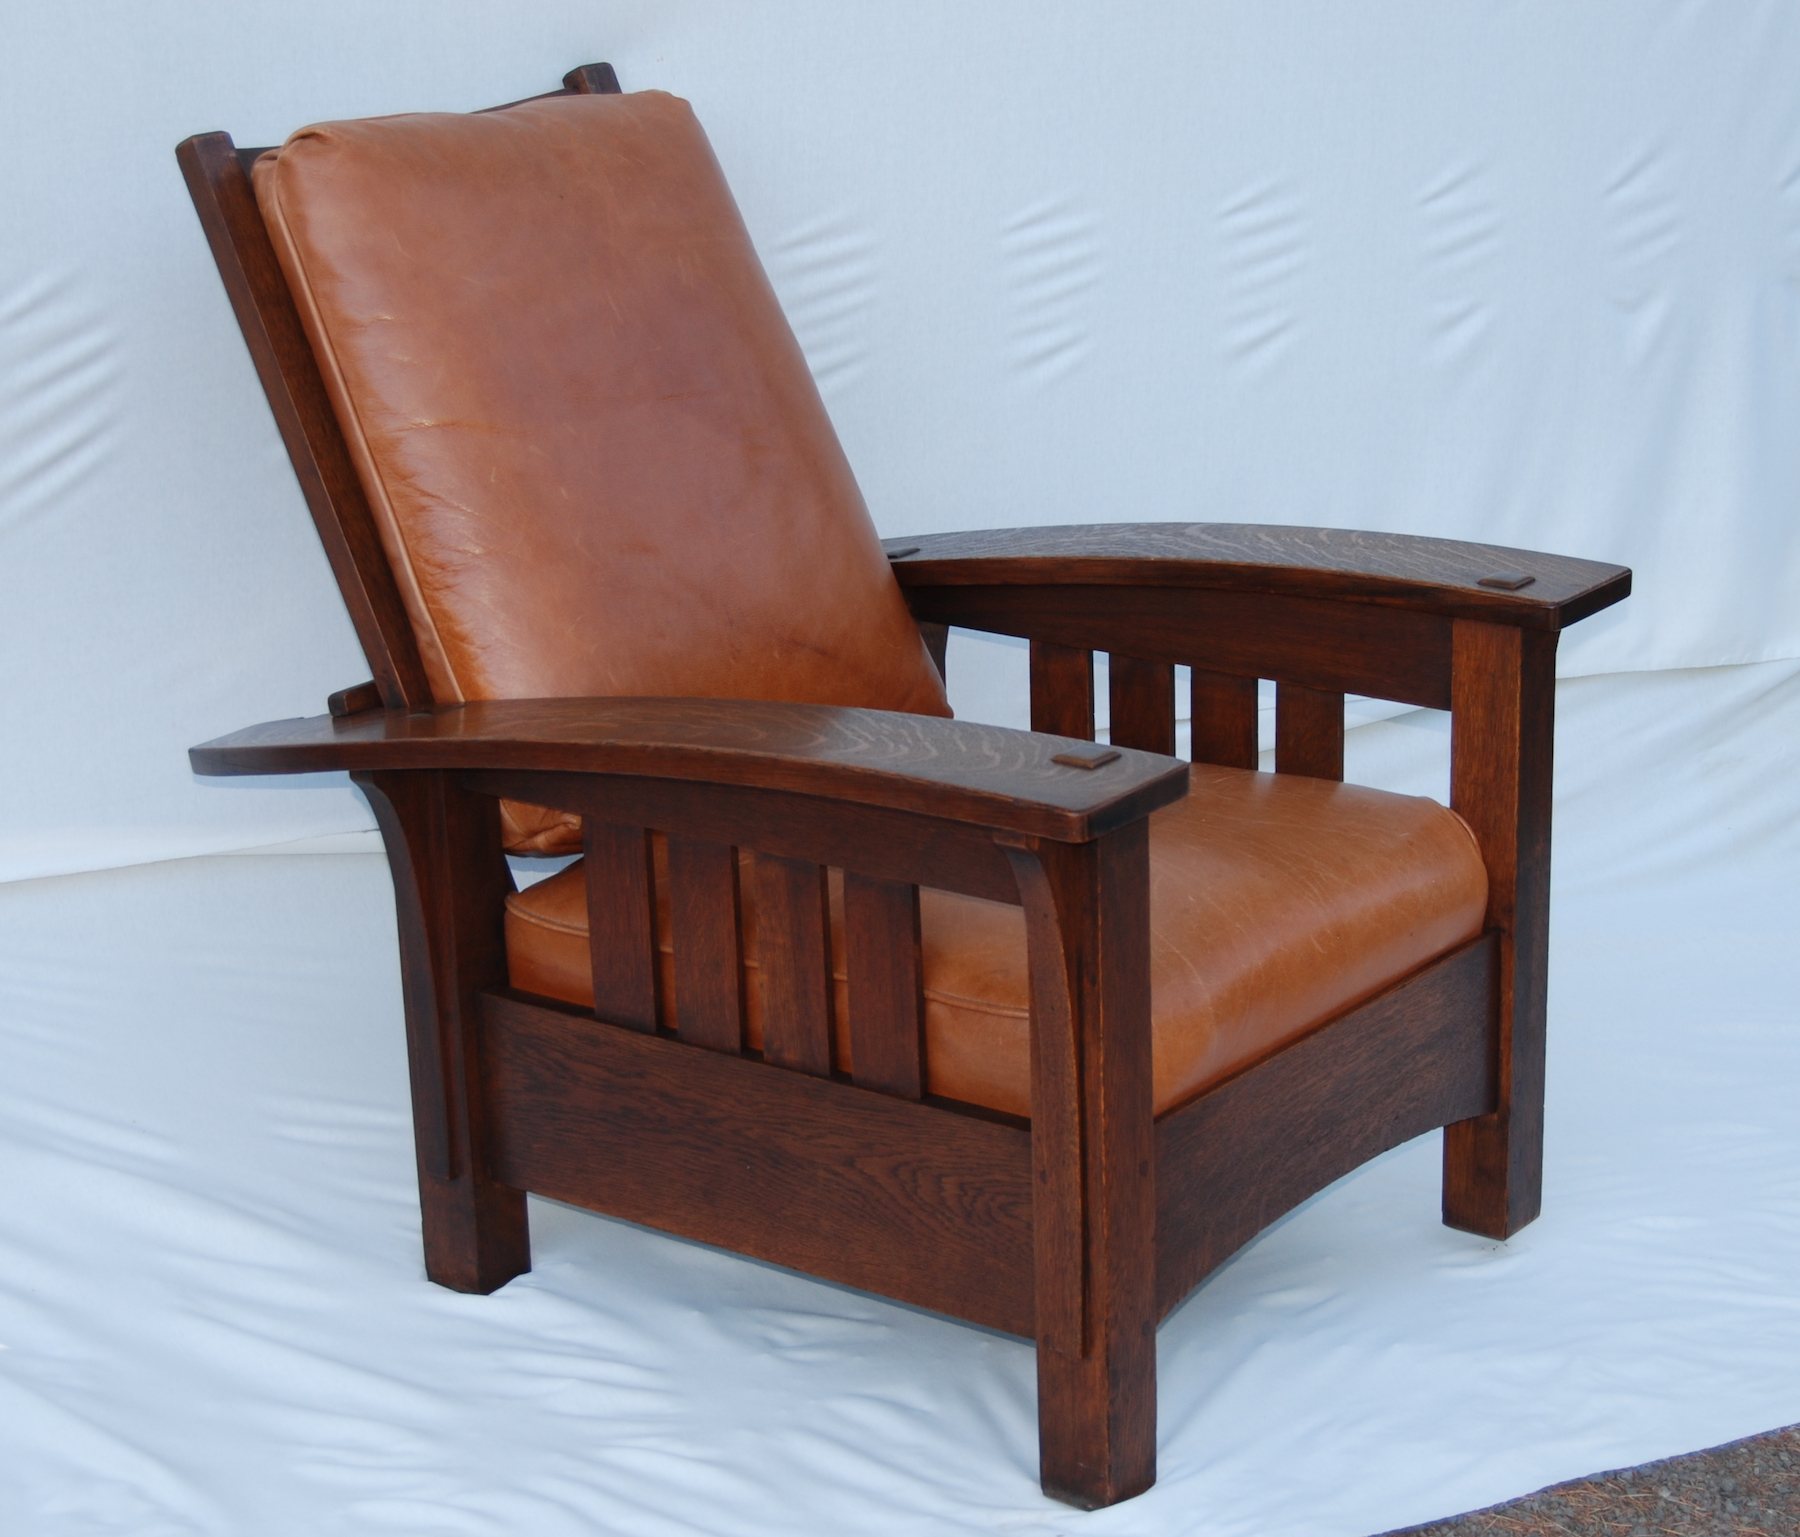 Voorhees Craftsman Mission Oak Furniture  Original Rare L